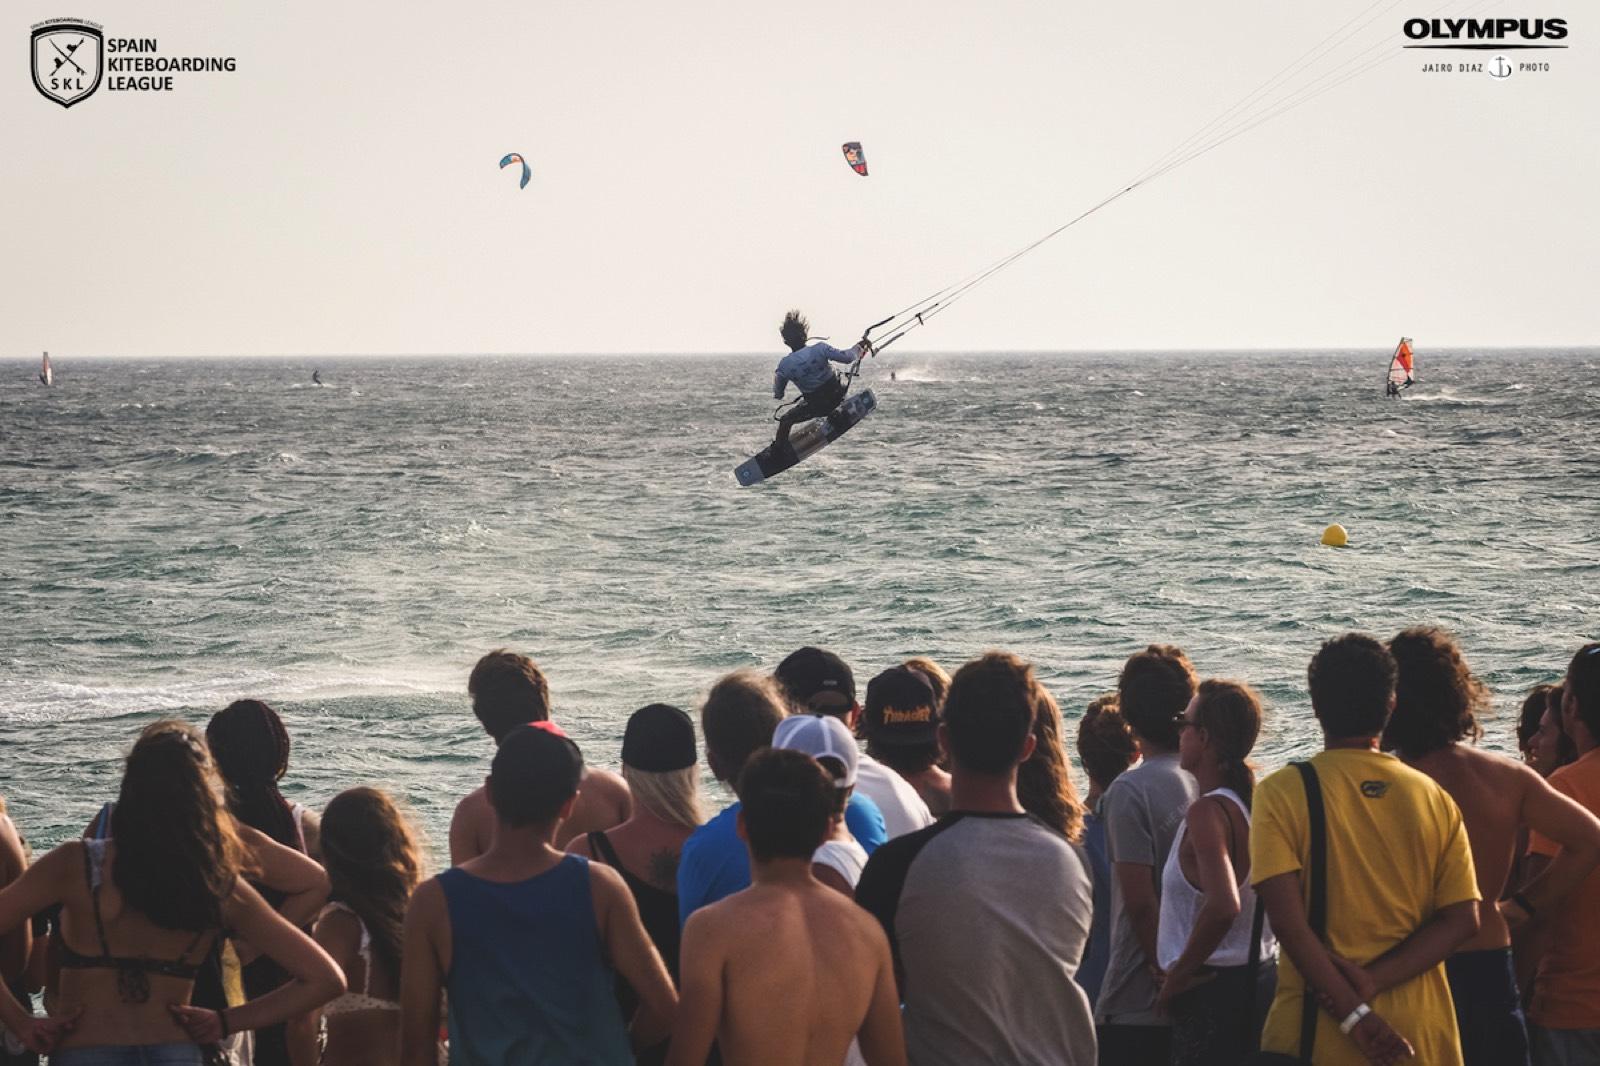 galeria-spain-kiteboarding-league-2018-35